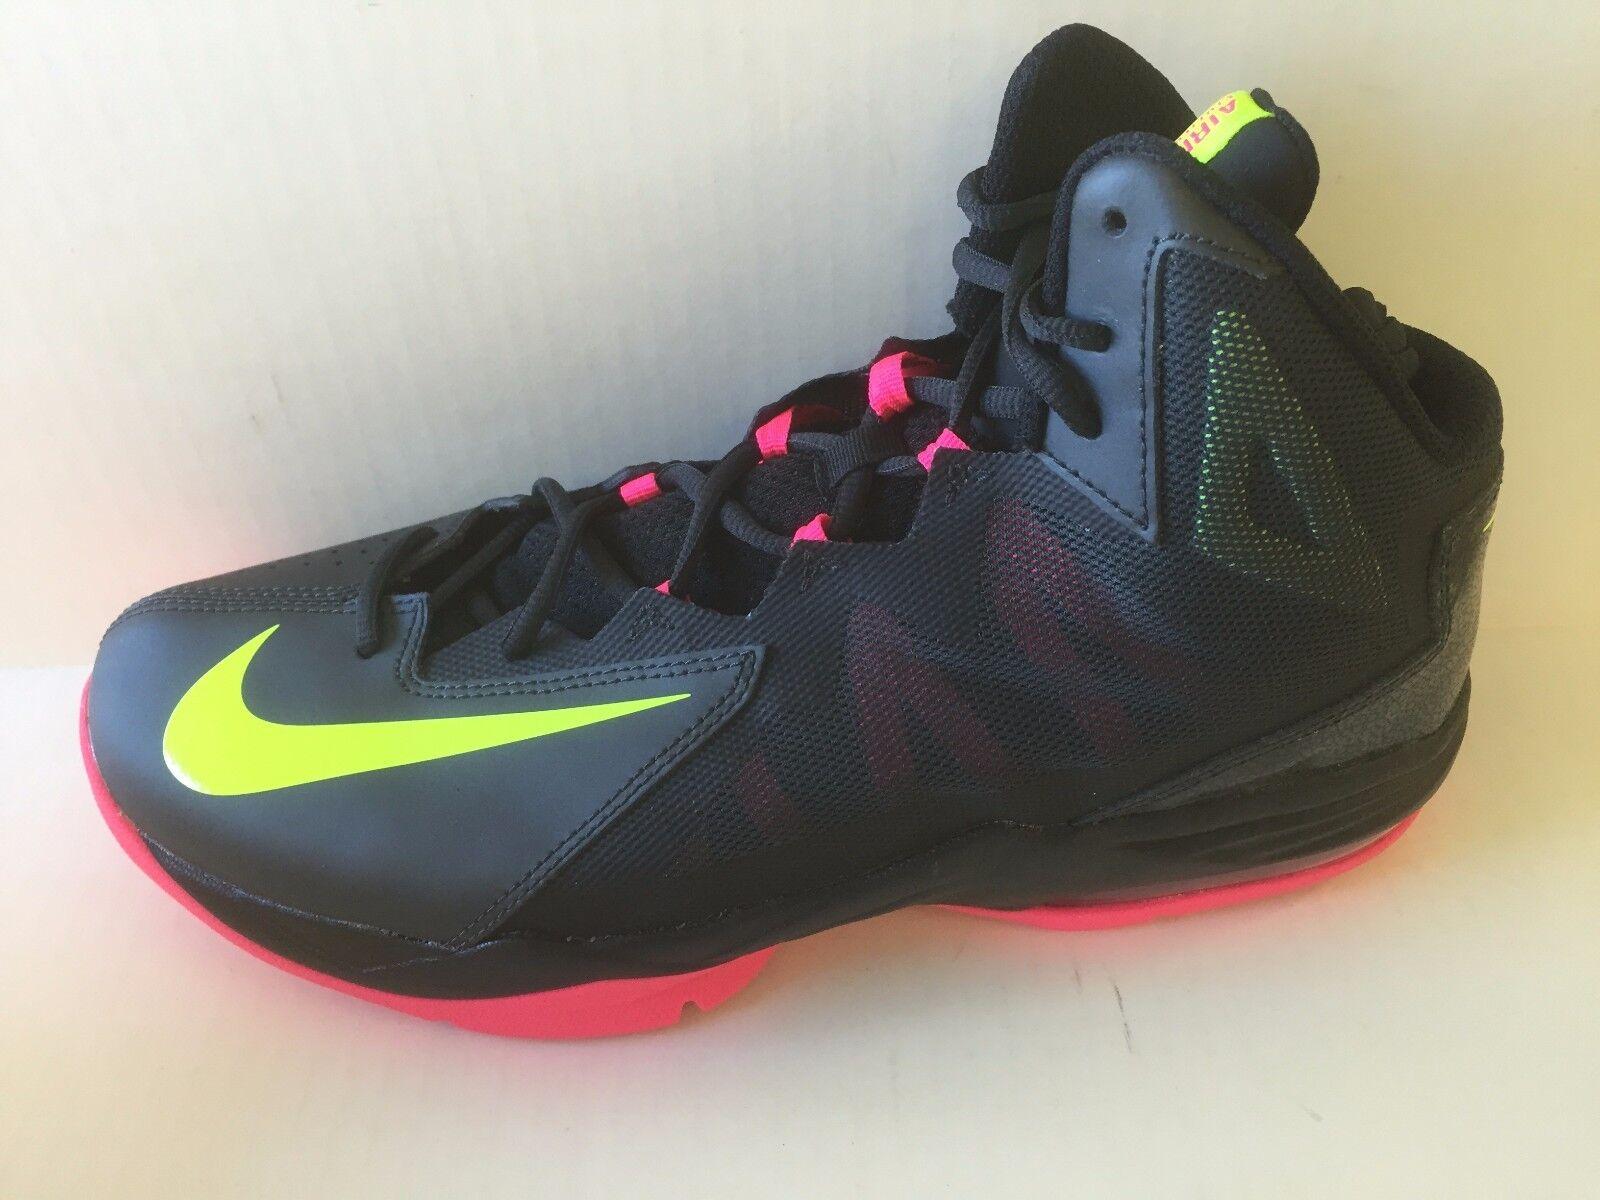 Hombres Nike Air Max Basketball tartamudean paso 2 Athletic Basketball Max zapatos Laces 11,5 multicolor 21ec9b